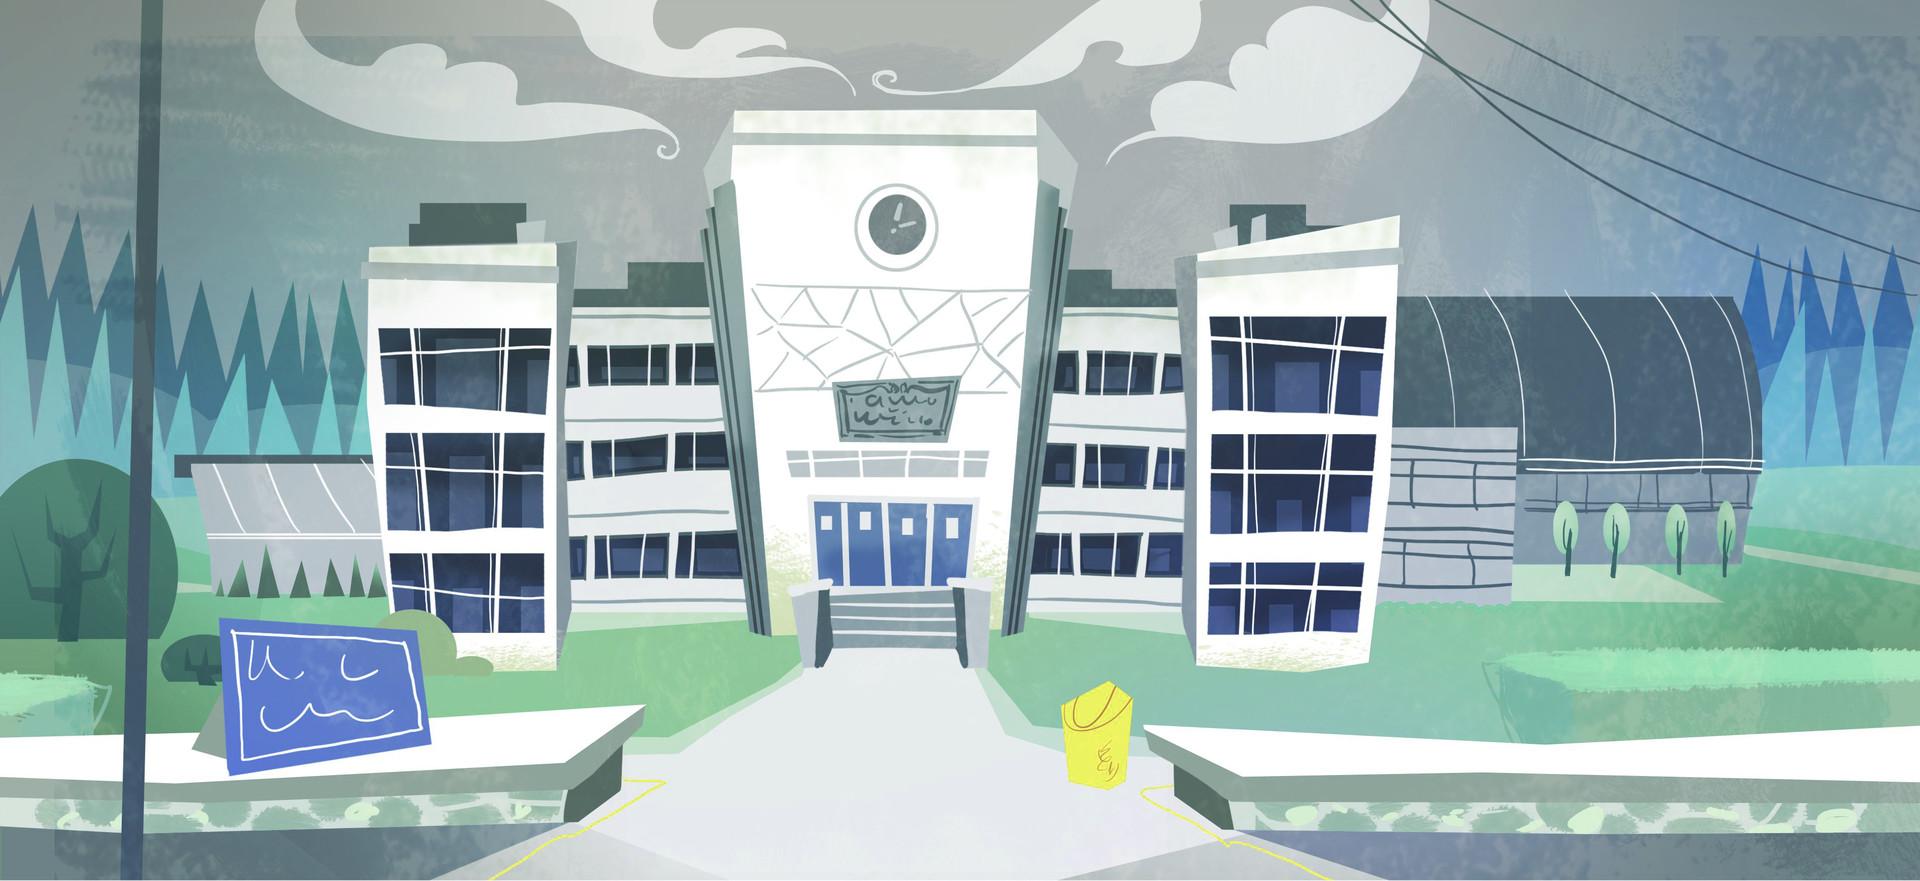 Marguerite sauvage school exterior 1